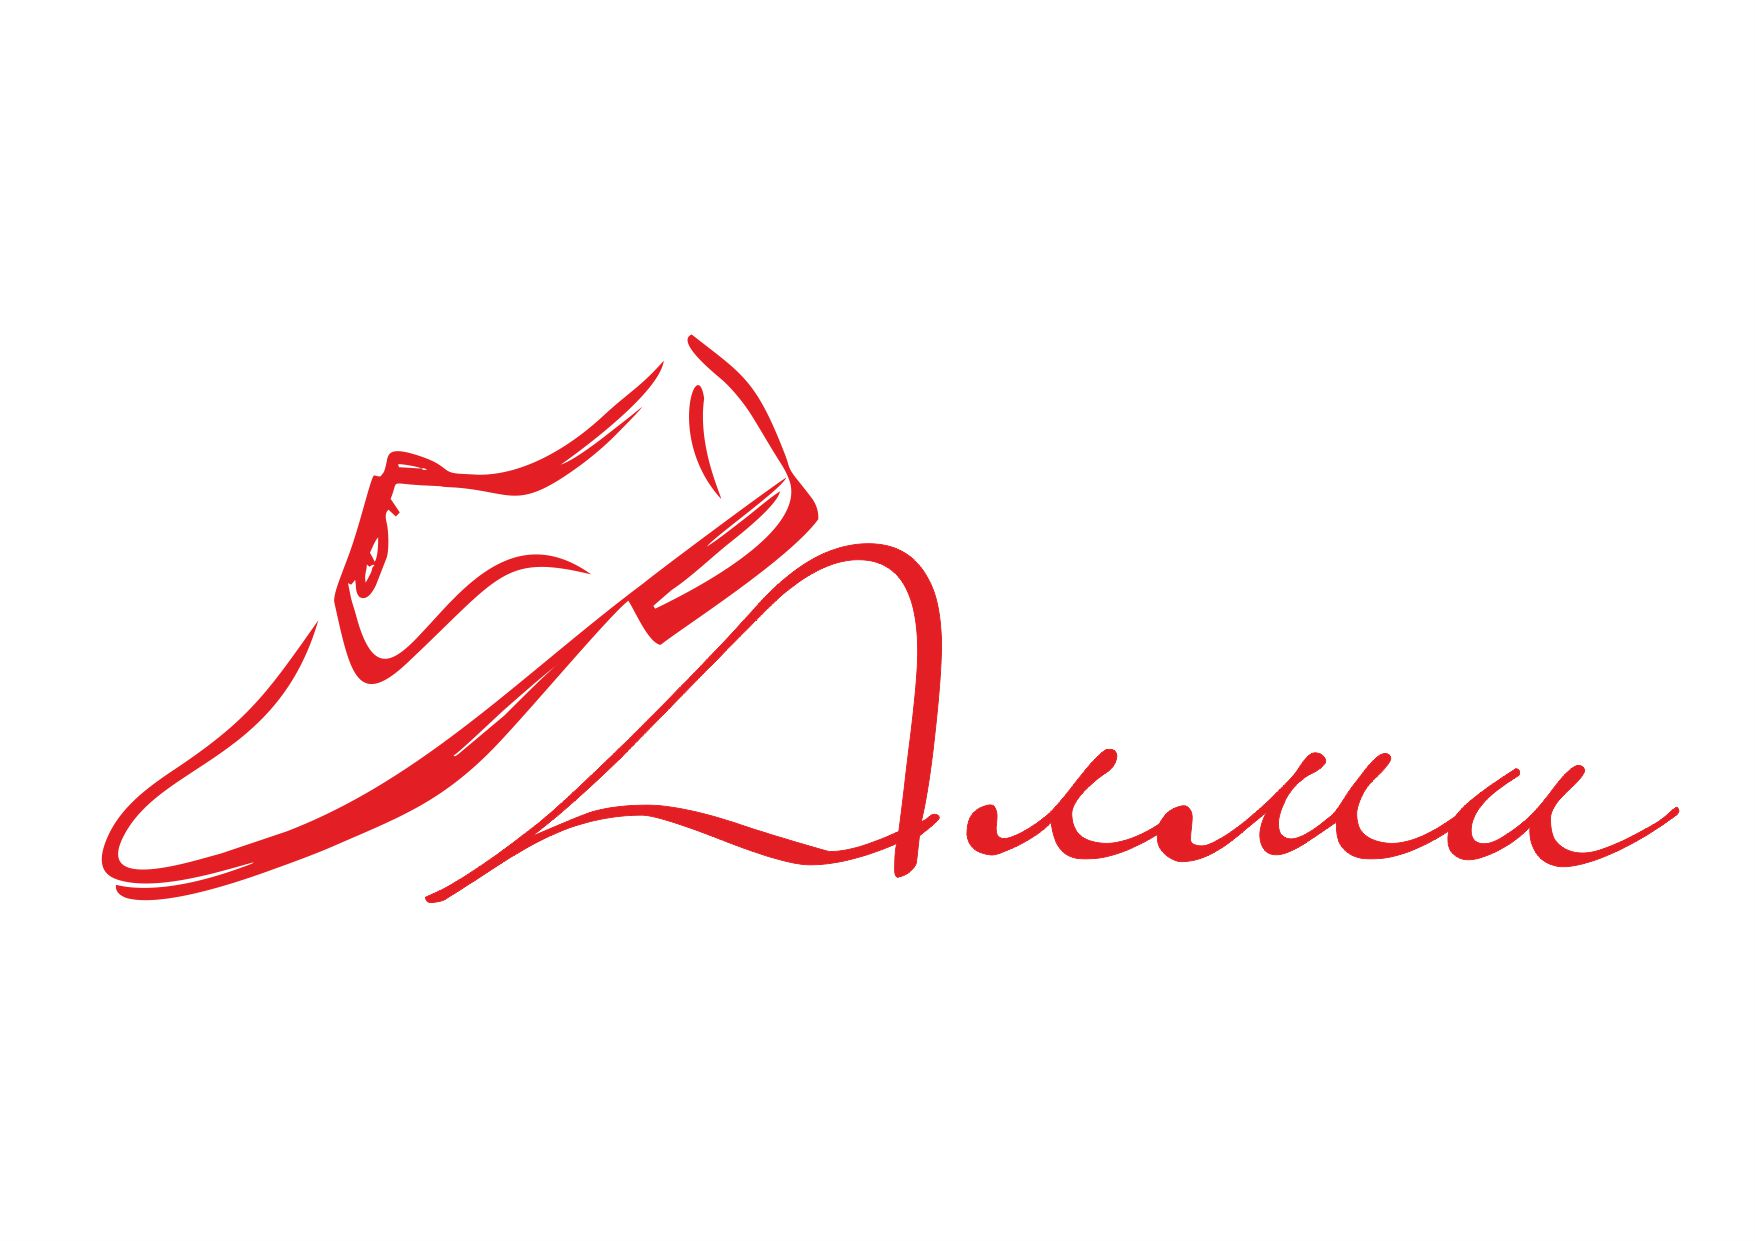 Дизайн логотипа обувной марки Алми фото f_28659d9cbf76891e.jpg